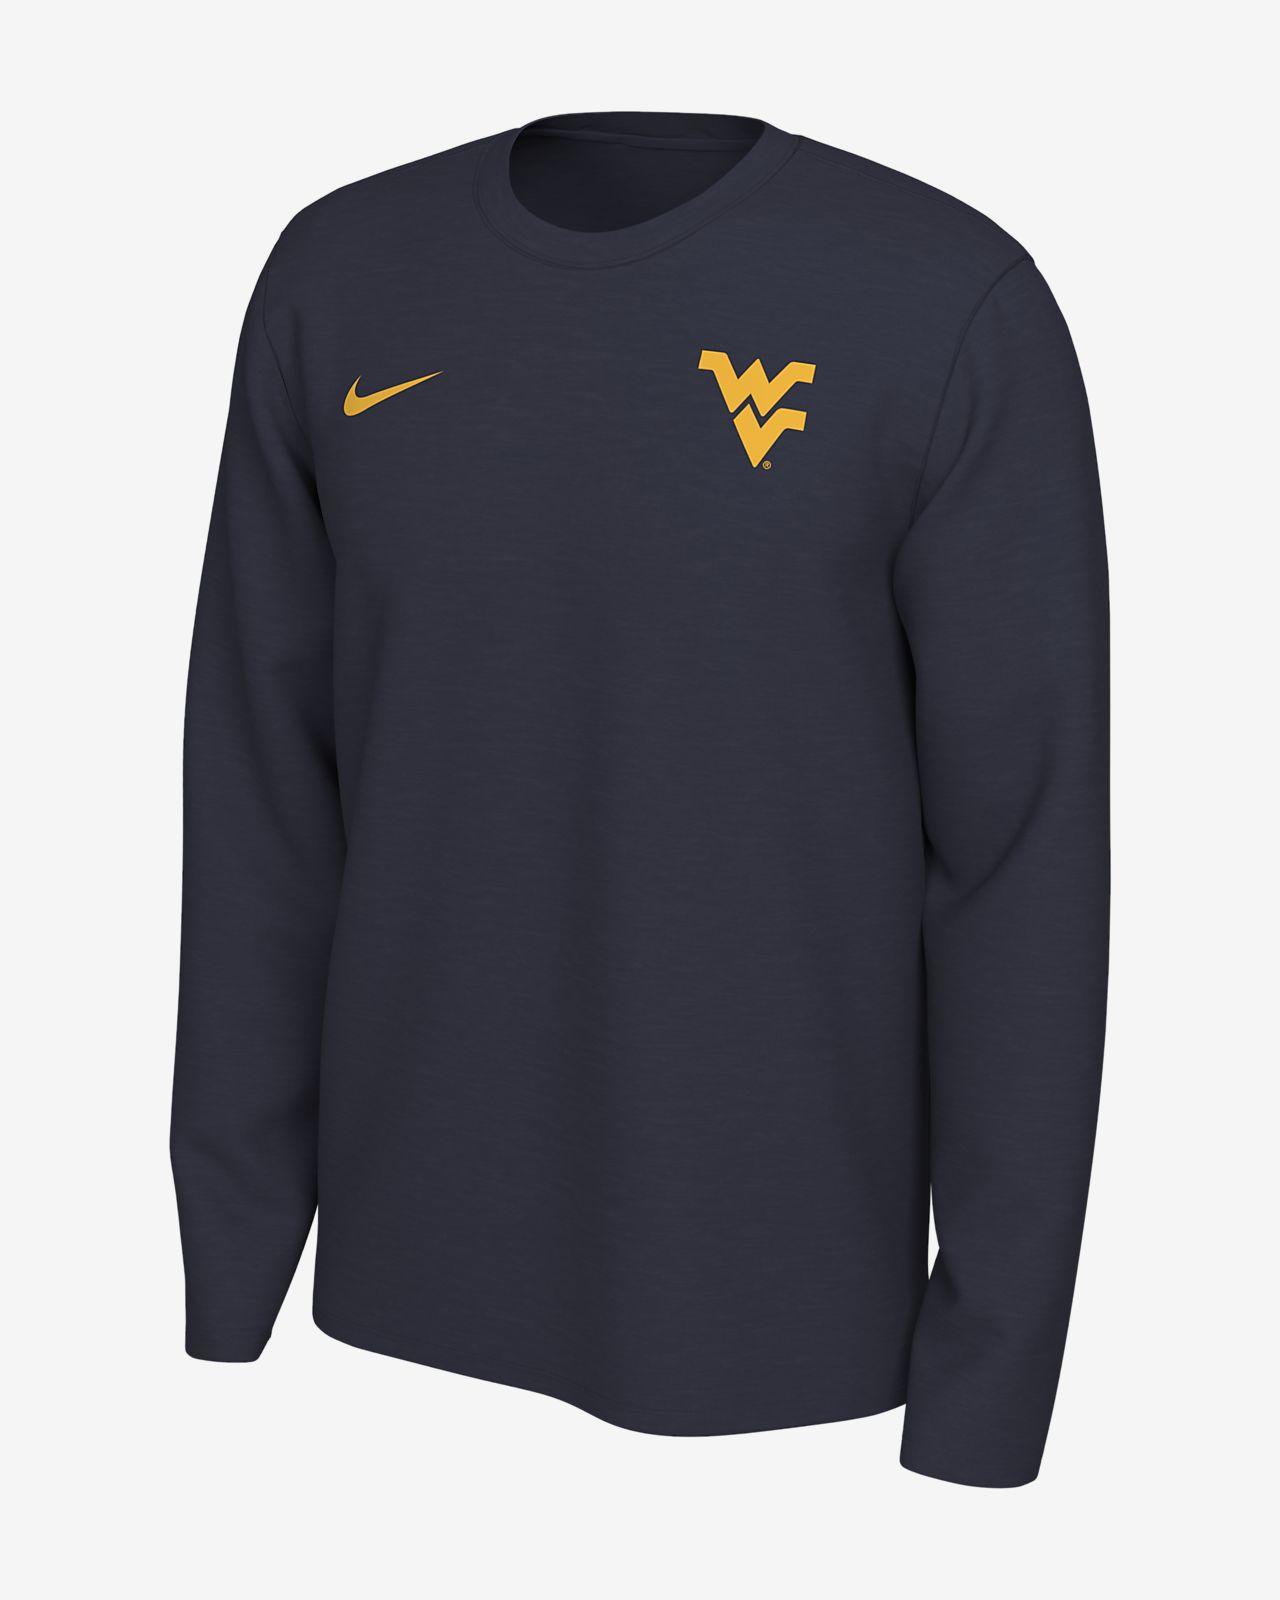 Nike Legend (West Virginia) Men's Long-Sleeve Logo T-Shirt